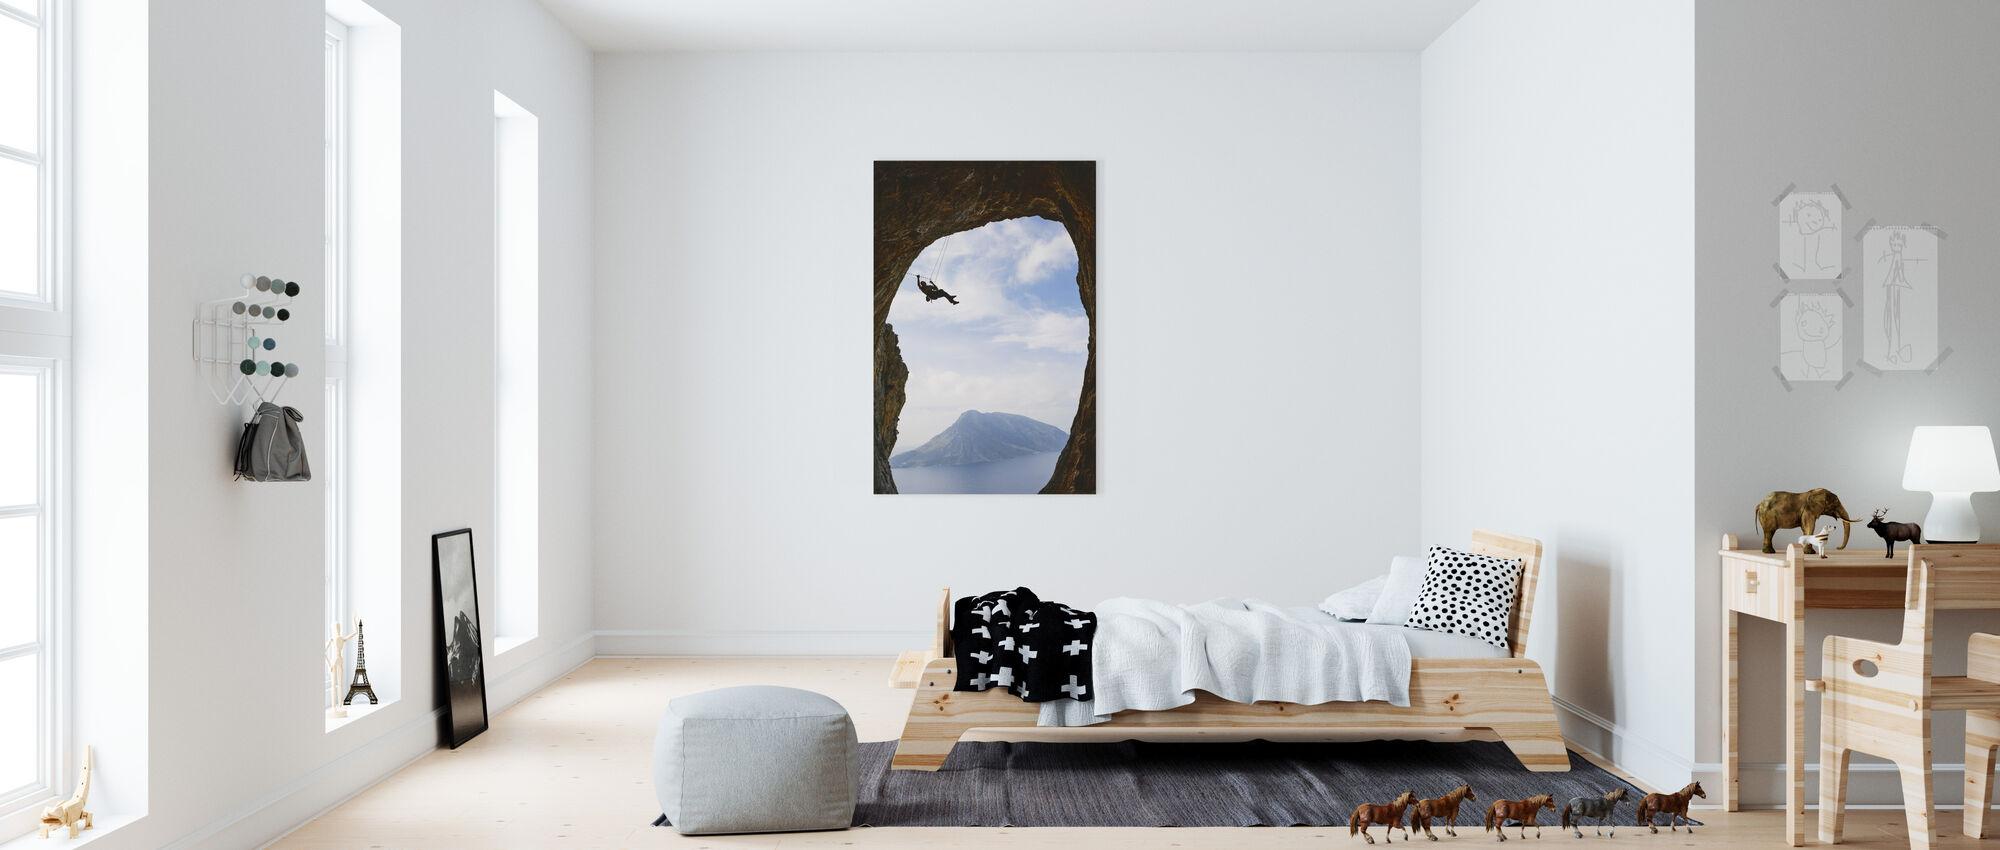 Mountain Climbing - Canvas print - Kids Room